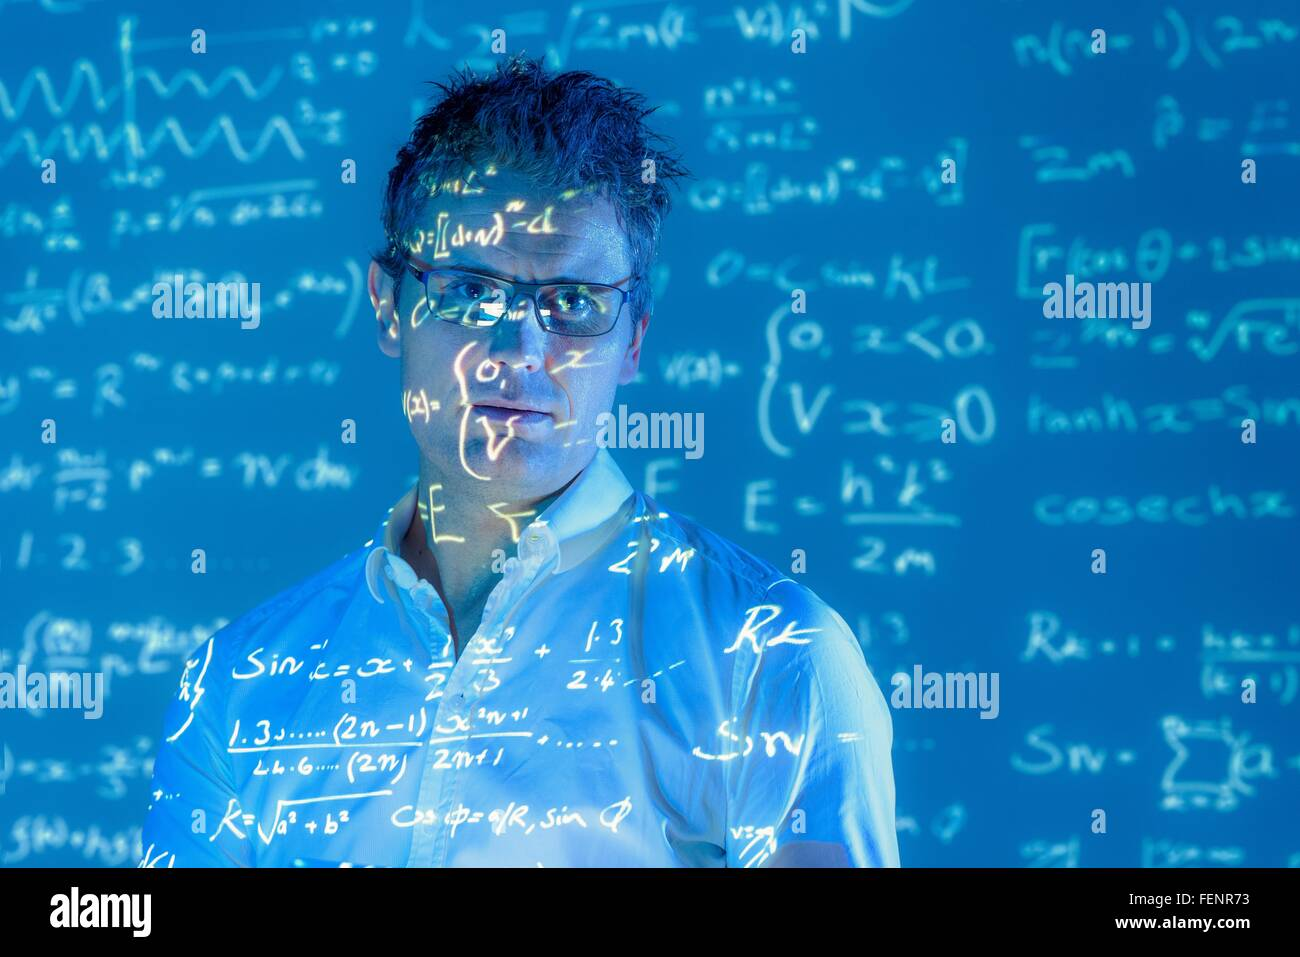 Retrato de científico con datos matemáticos proyectados Imagen De Stock